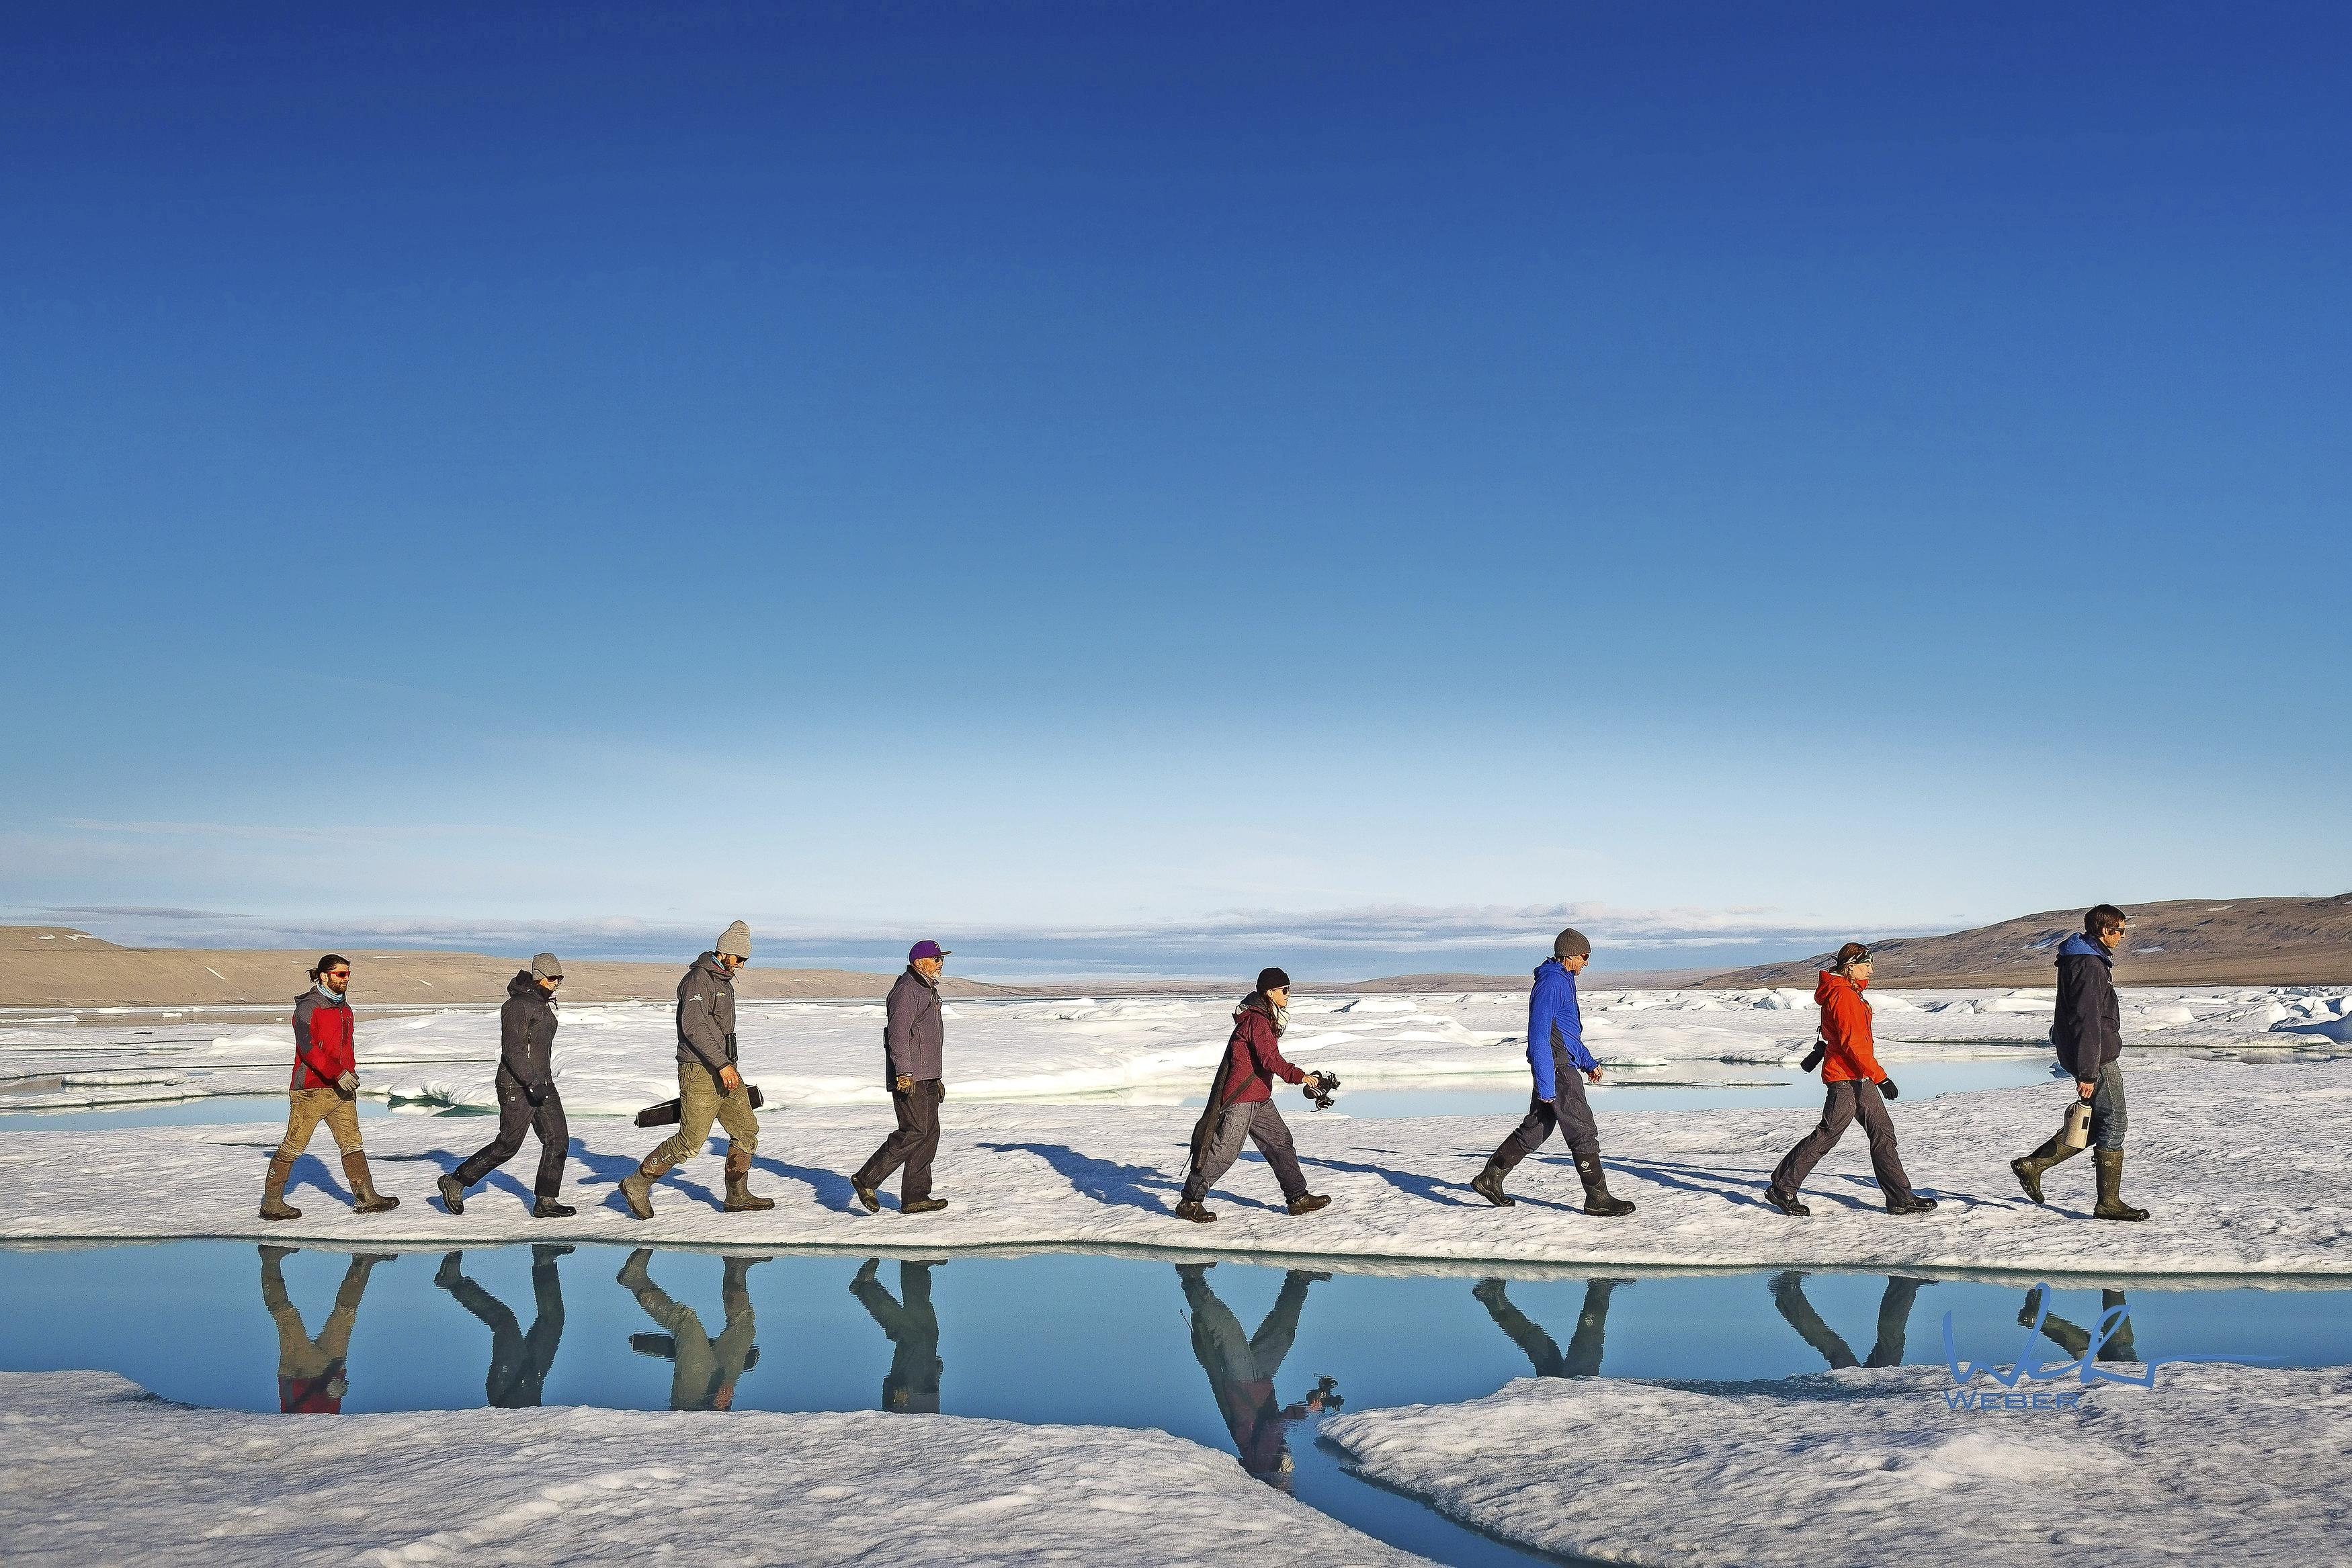 Kanada: Arktis pur